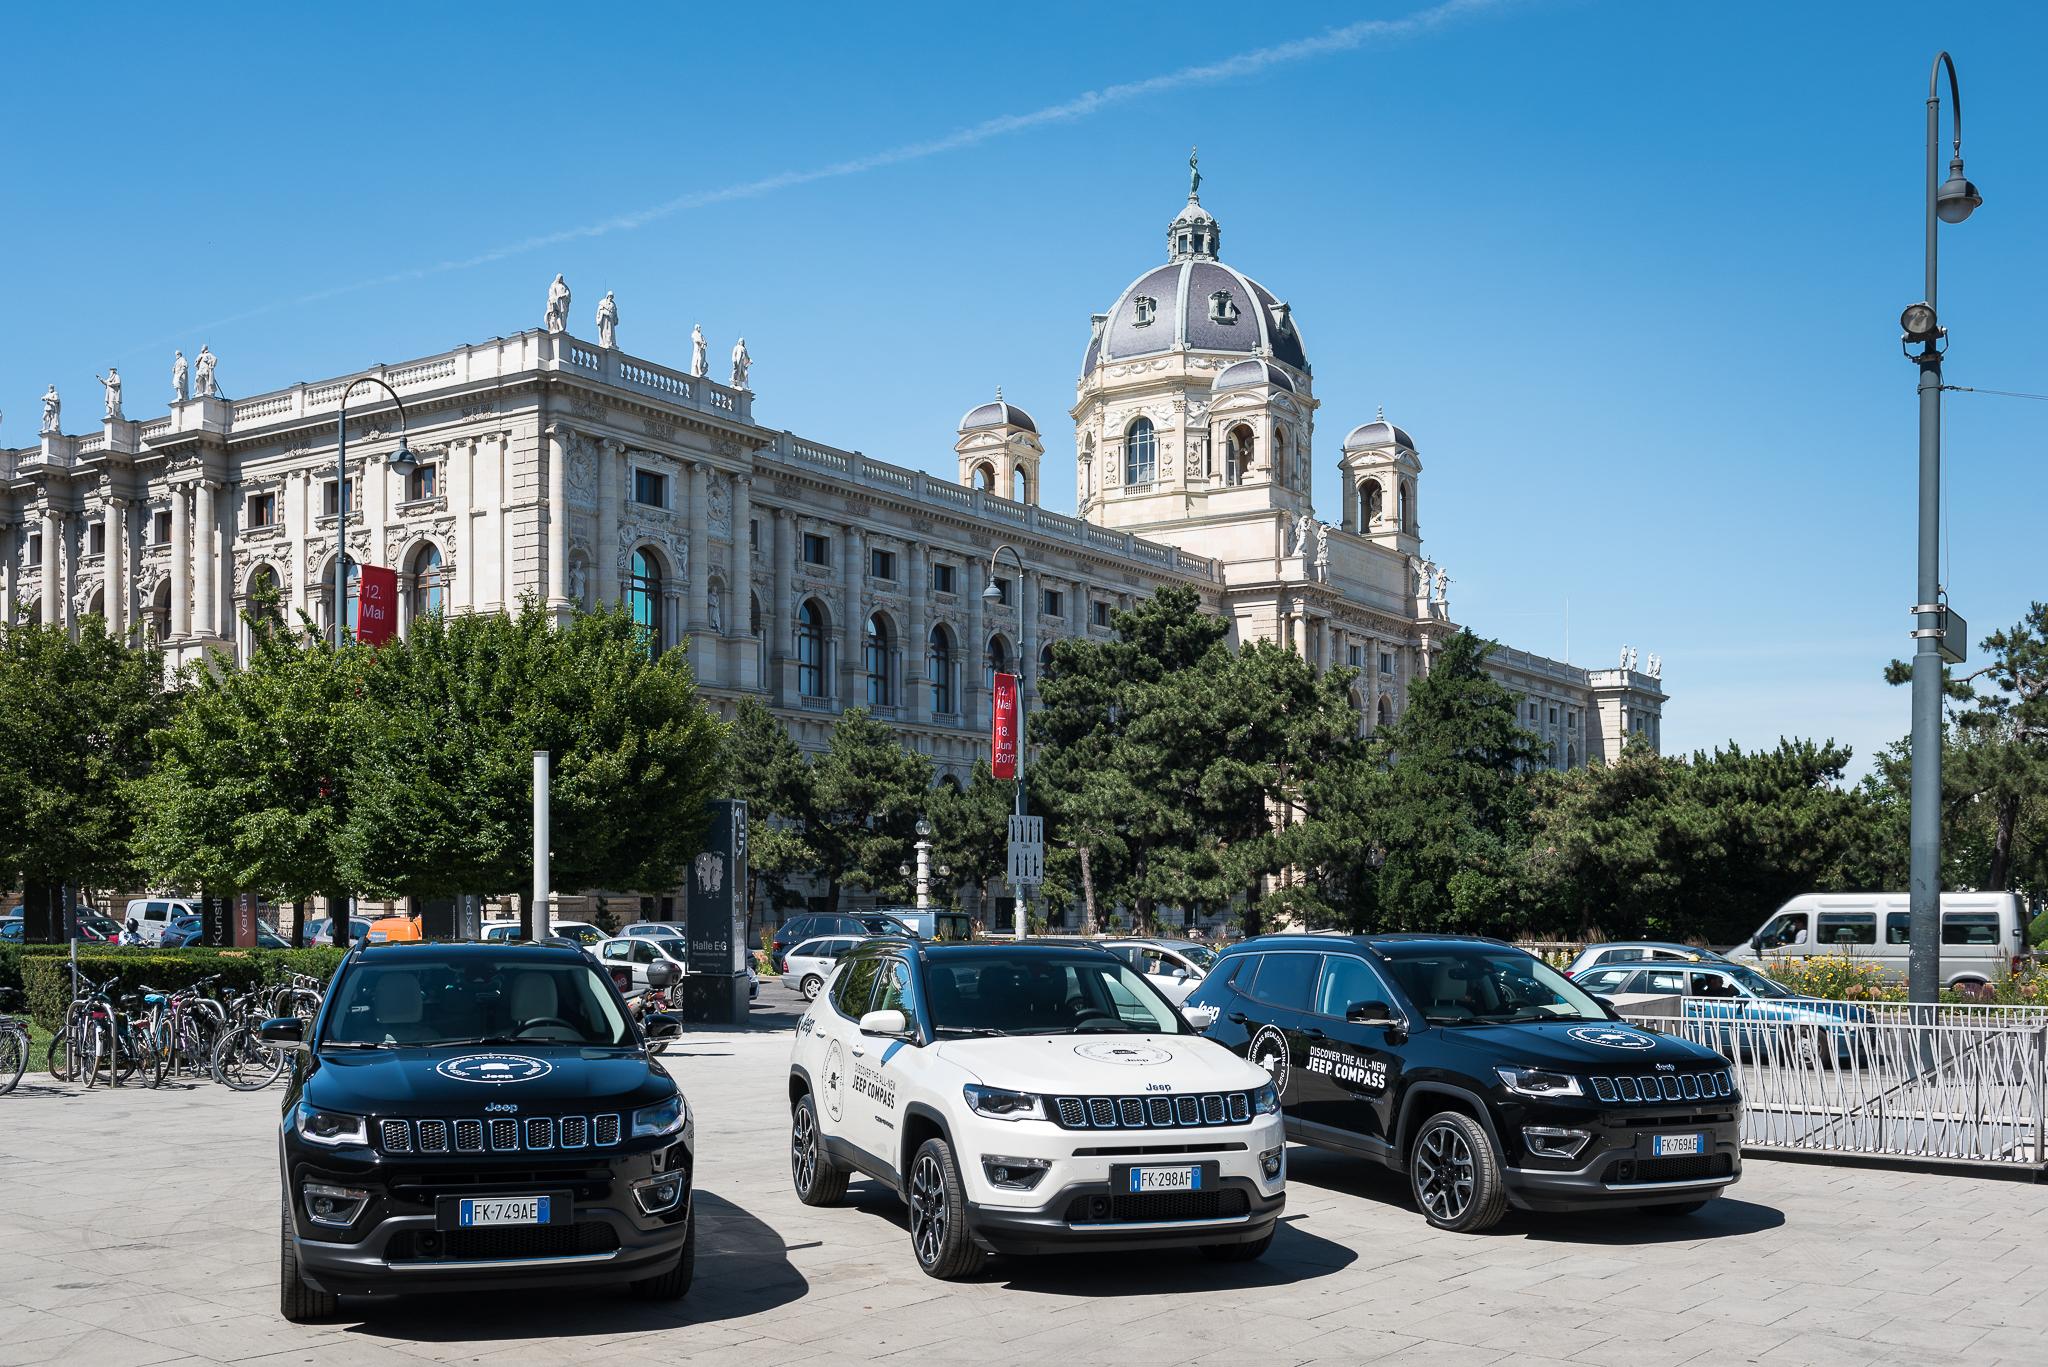 Präsentation des neuen Jeep Compass beim Museumsquartier Wien